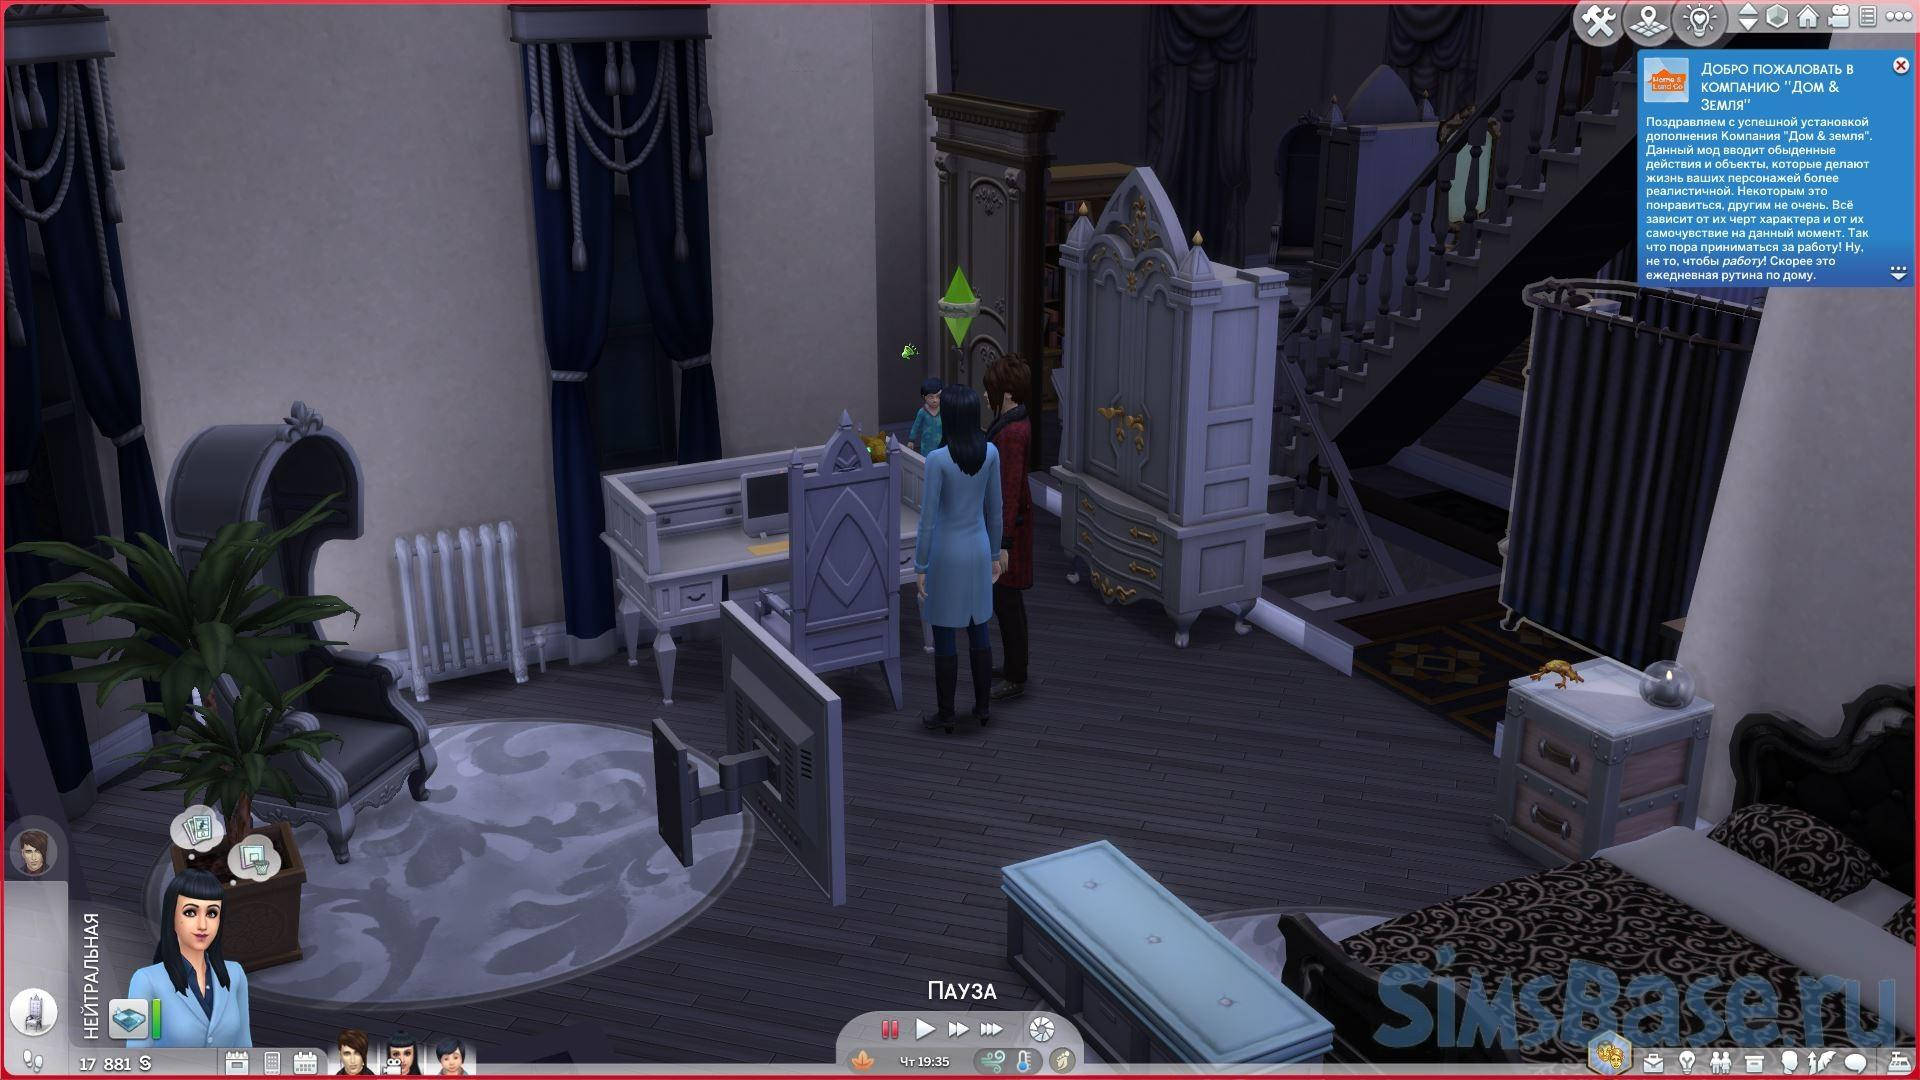 Мод «Компания Дом и земля или Home and land company» от simrealist для Sims 4